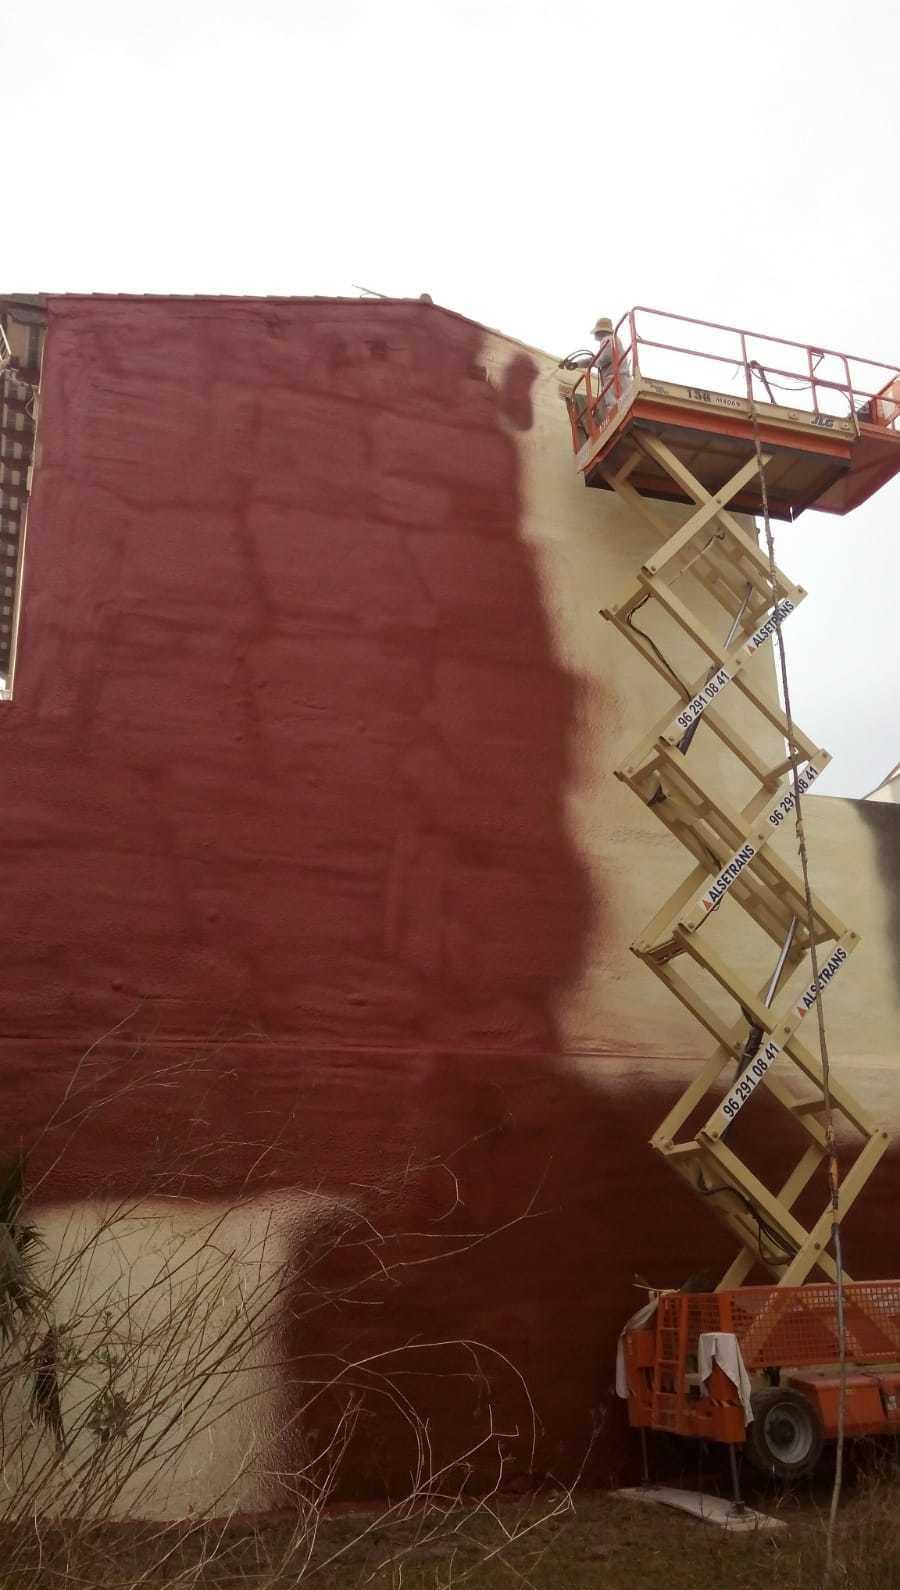 Foto 3 de Aislamientos acústicos y térmicos en Rafelcofer | Aislamientos de Poliuretano Jaime Femenia